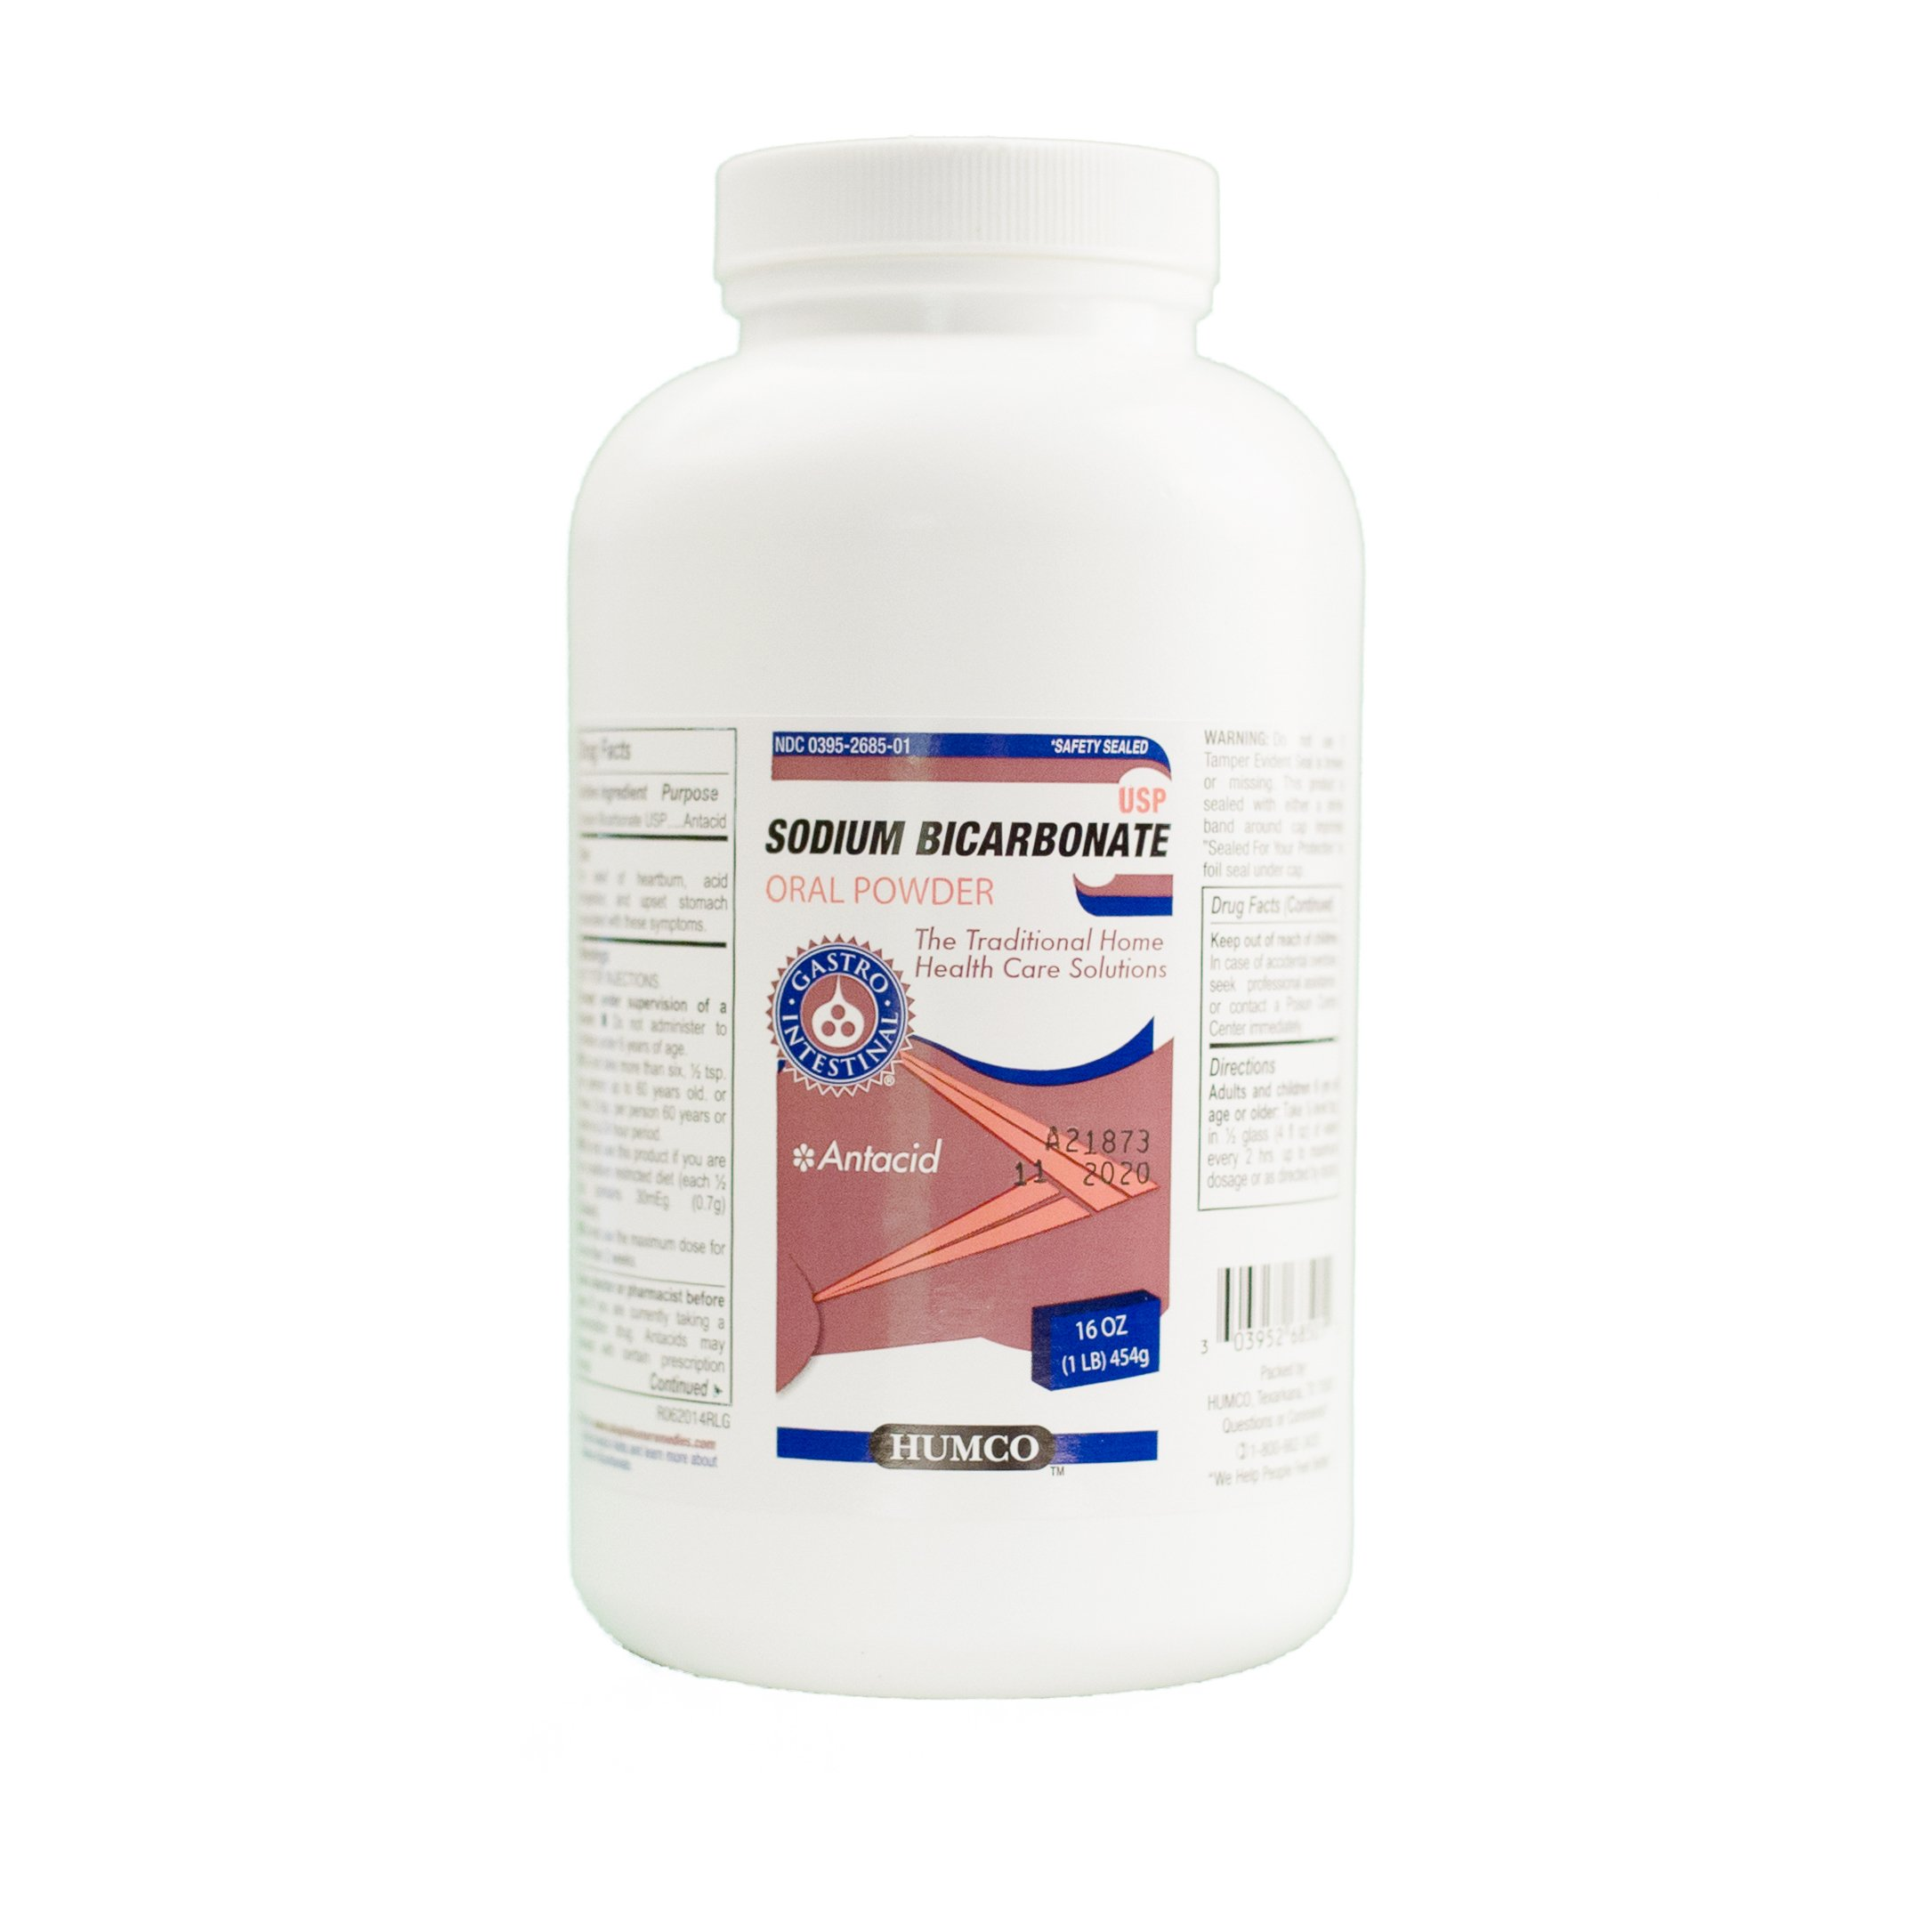 Humco Sodium Bicarbonate Powder, Oral, 1 lb.